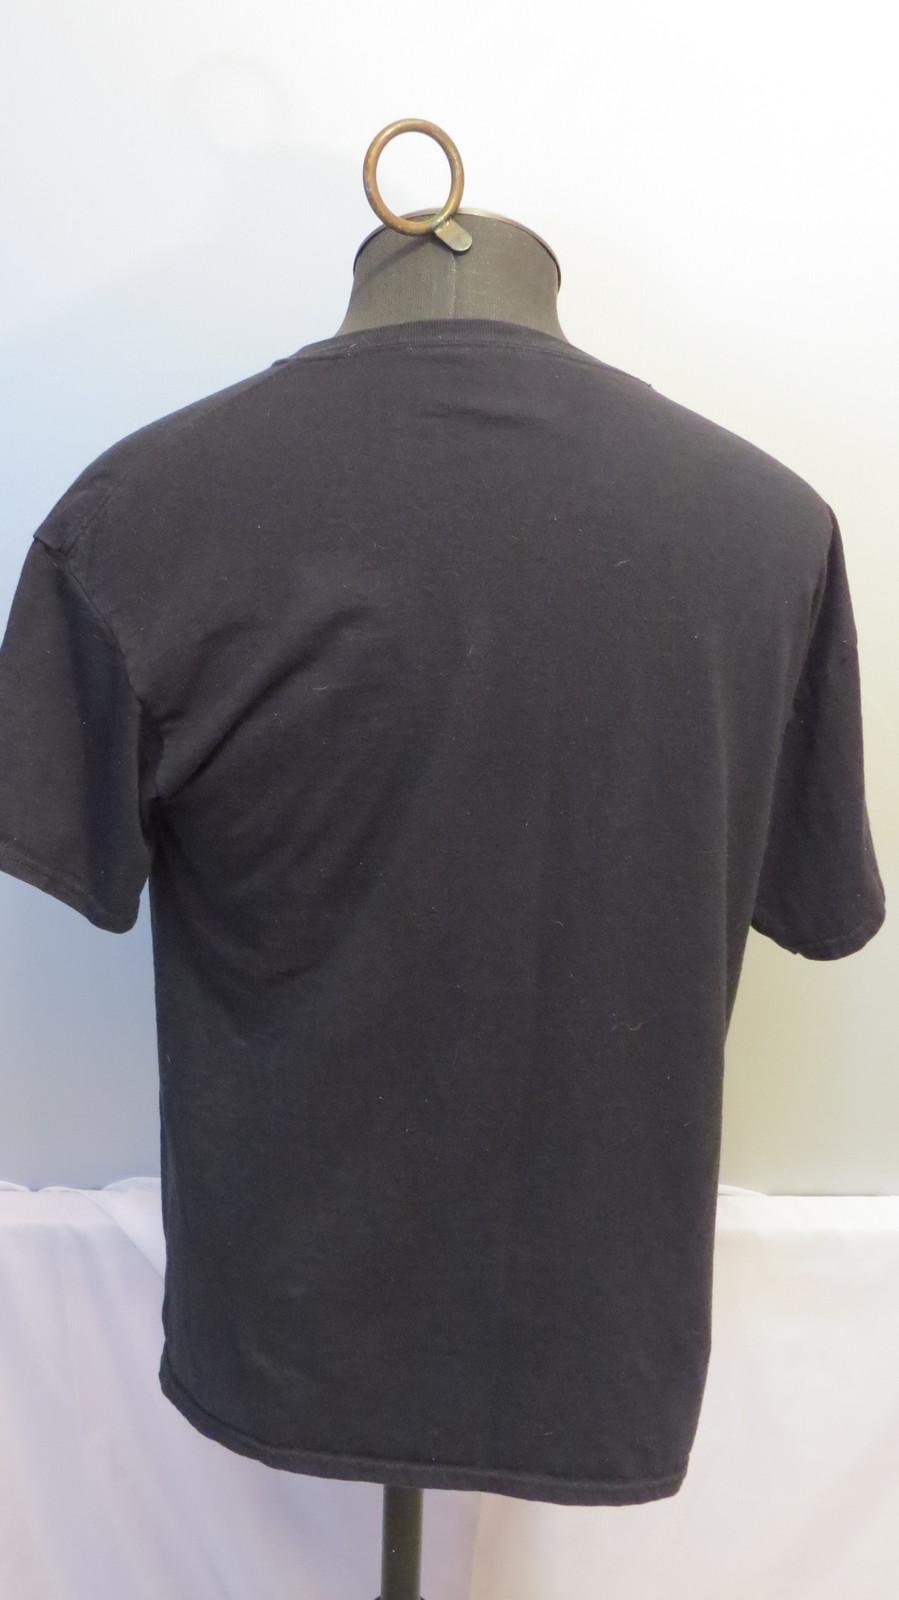 New World Order Shirt (Wrestling) - Large Classic Graphic - Men's Large